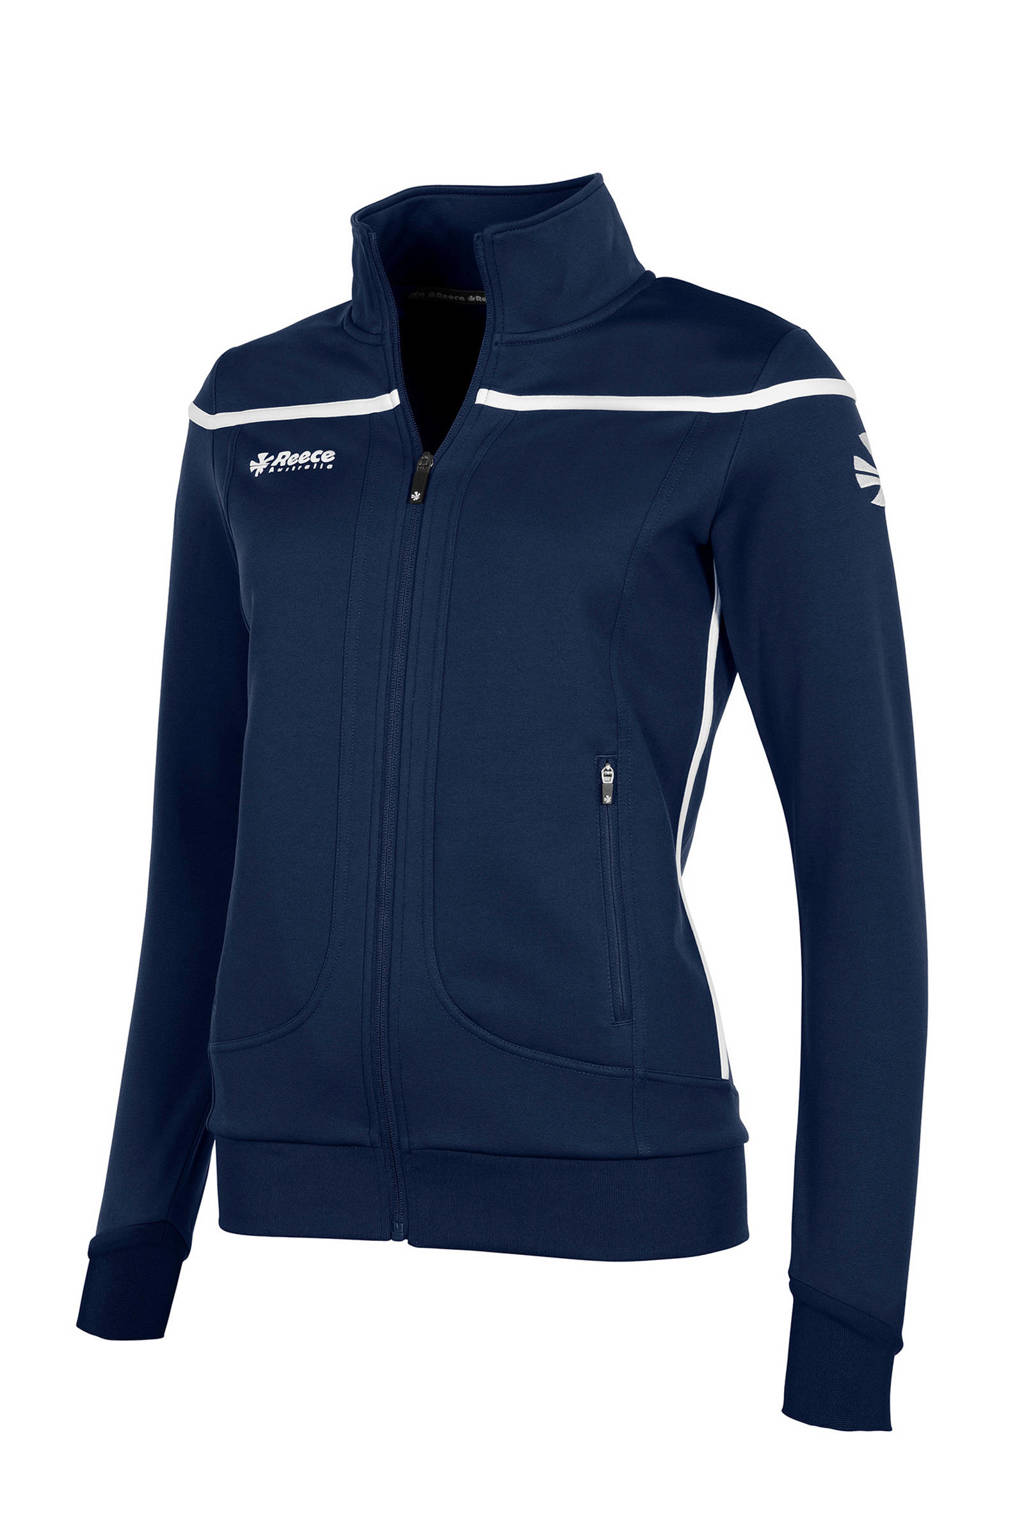 Reece Australia sportvest donkerblauw, Donkerblauw/wit